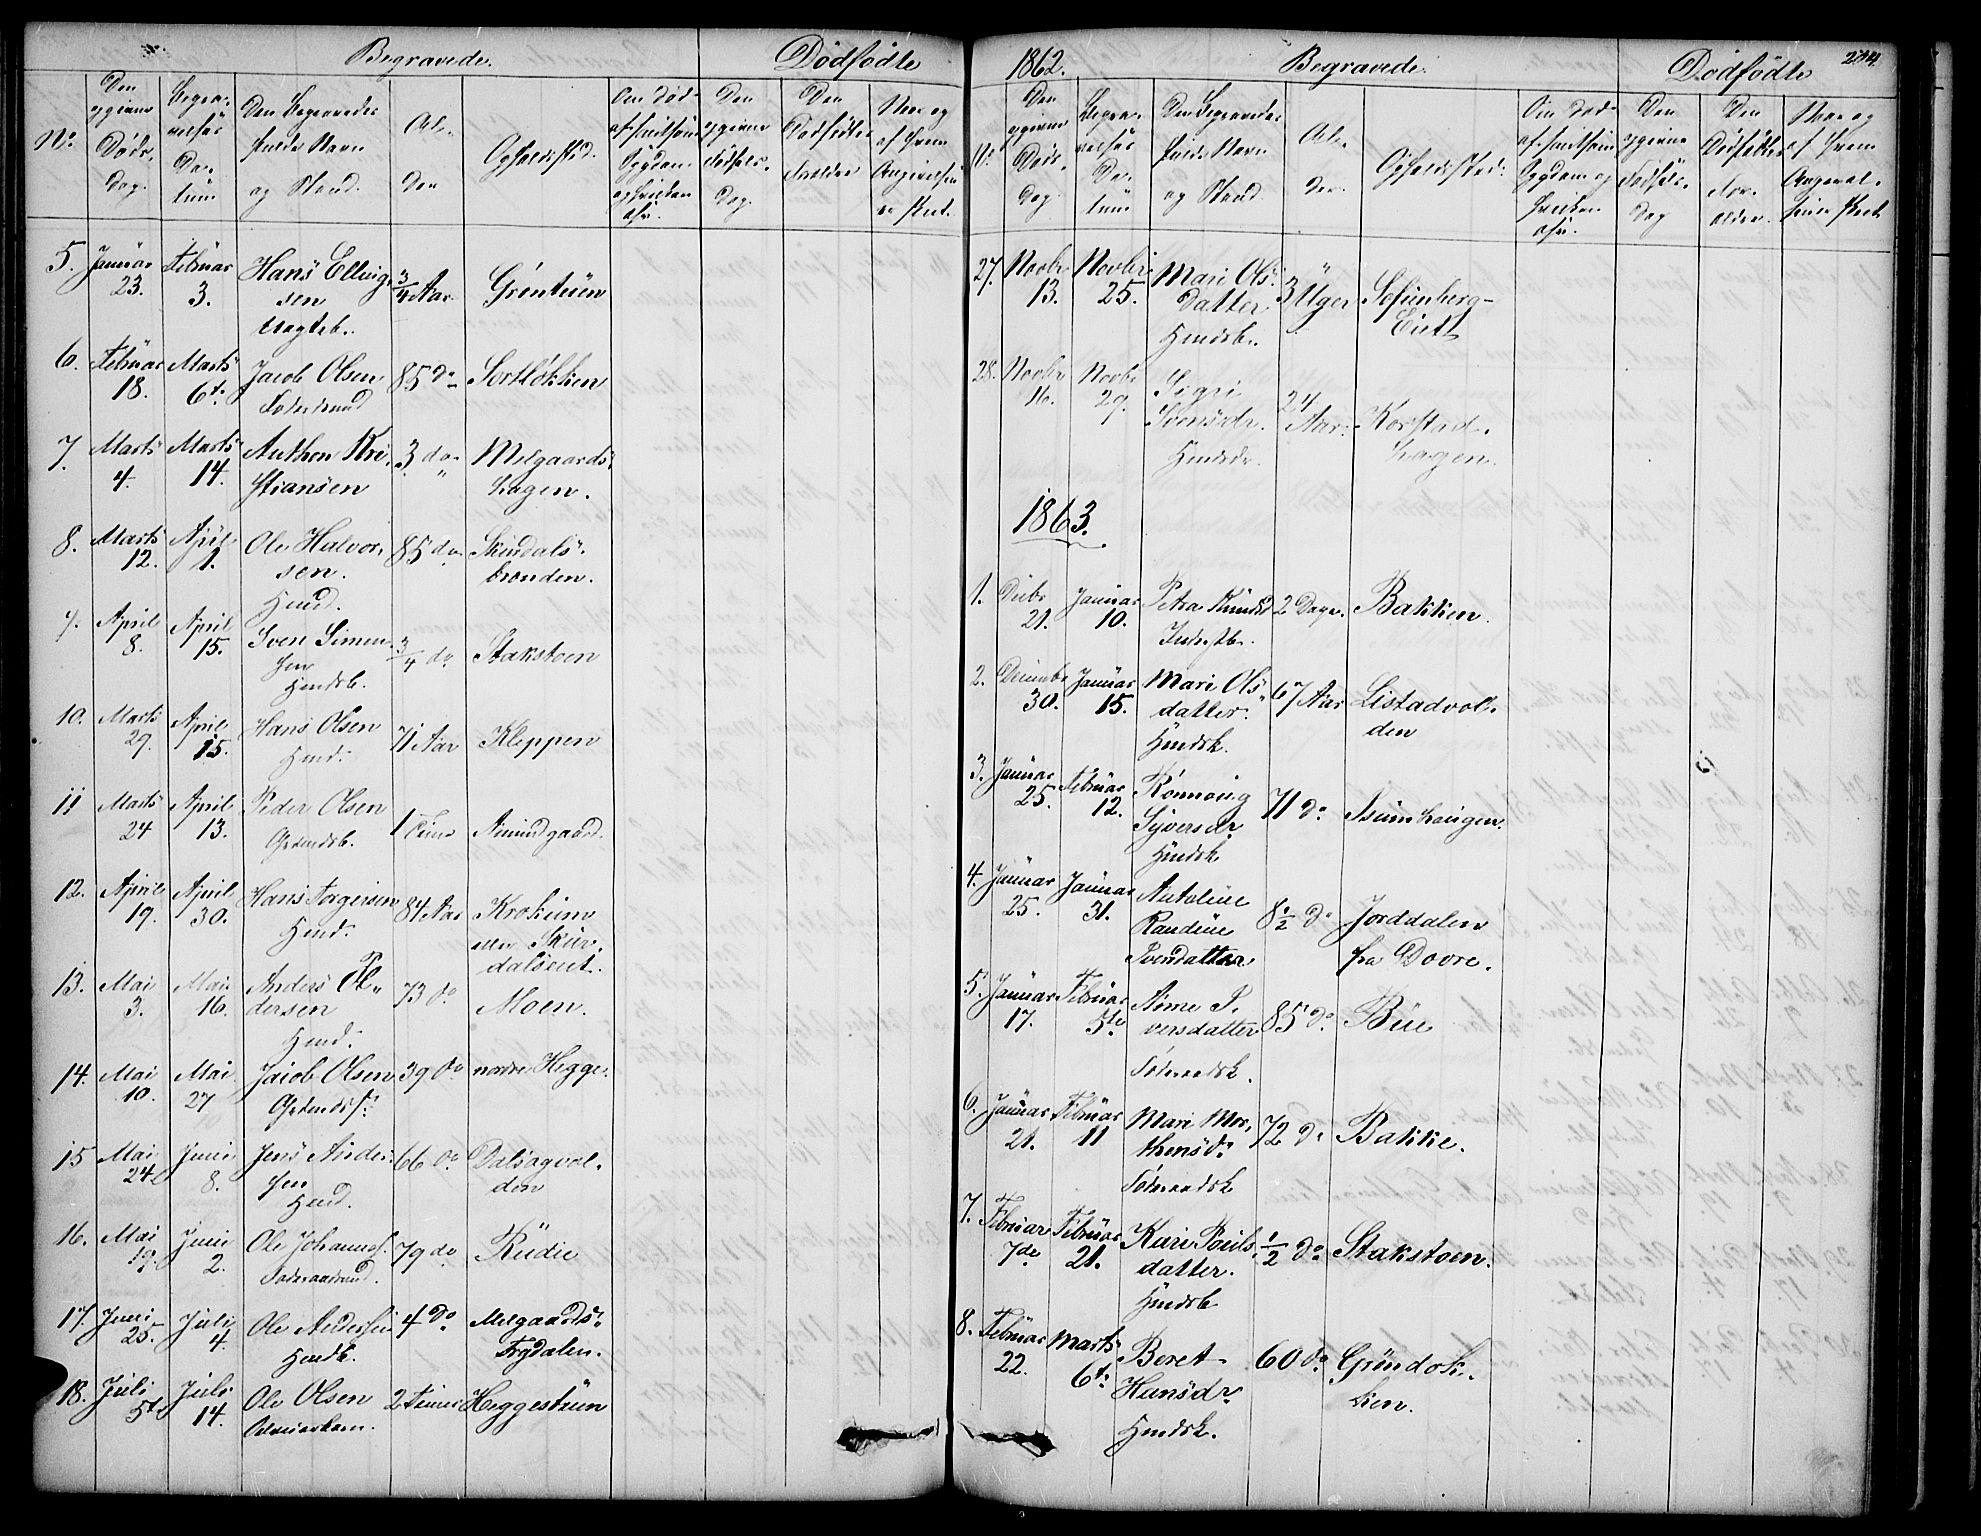 SAH, Sør-Fron prestekontor, H/Ha/Hab/L0001: Klokkerbok nr. 1, 1844-1863, s. 204